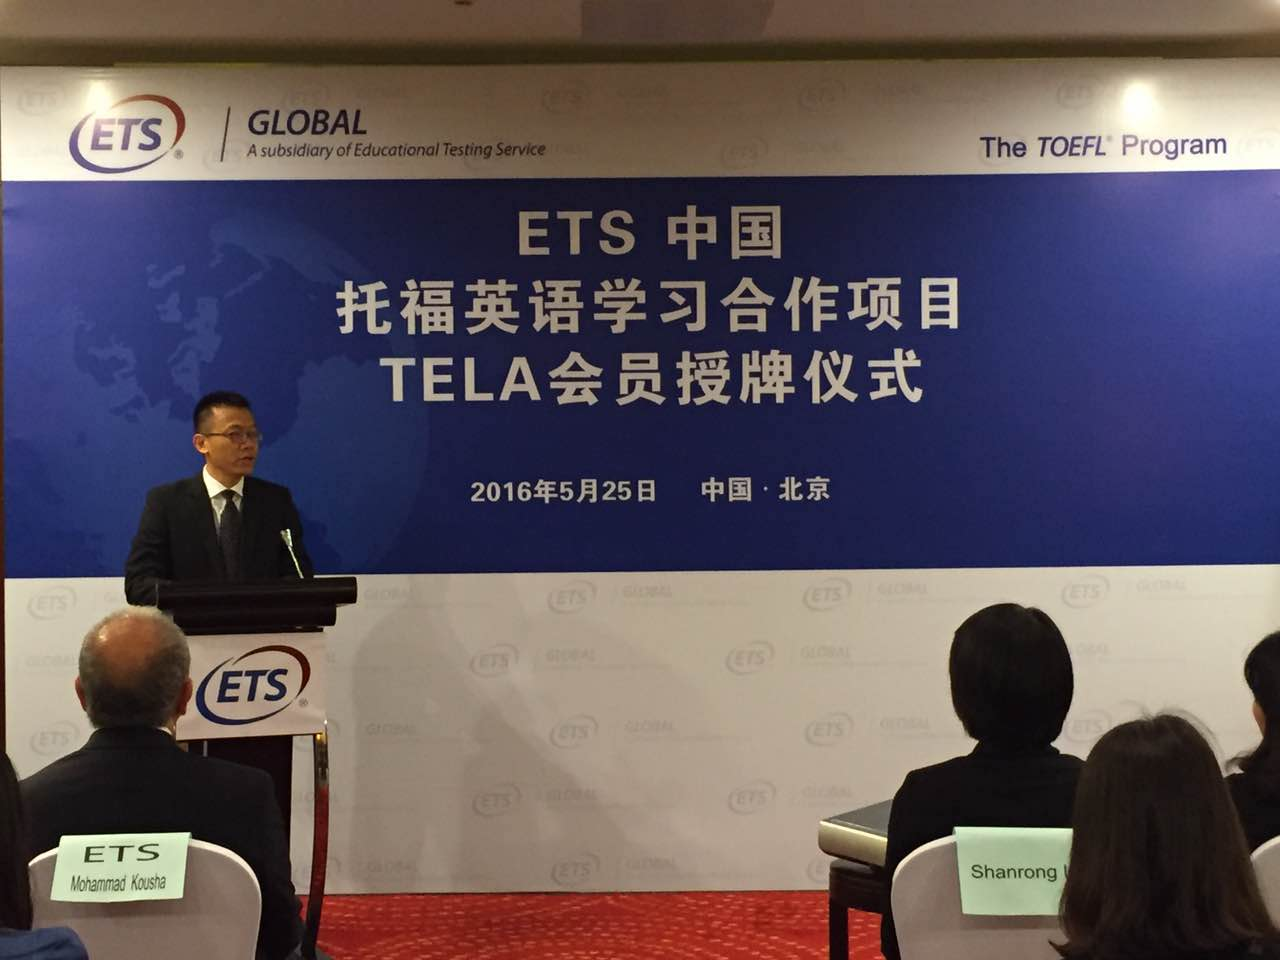 ETS发布TELA合作项目,为培训机构提供在线托福资源